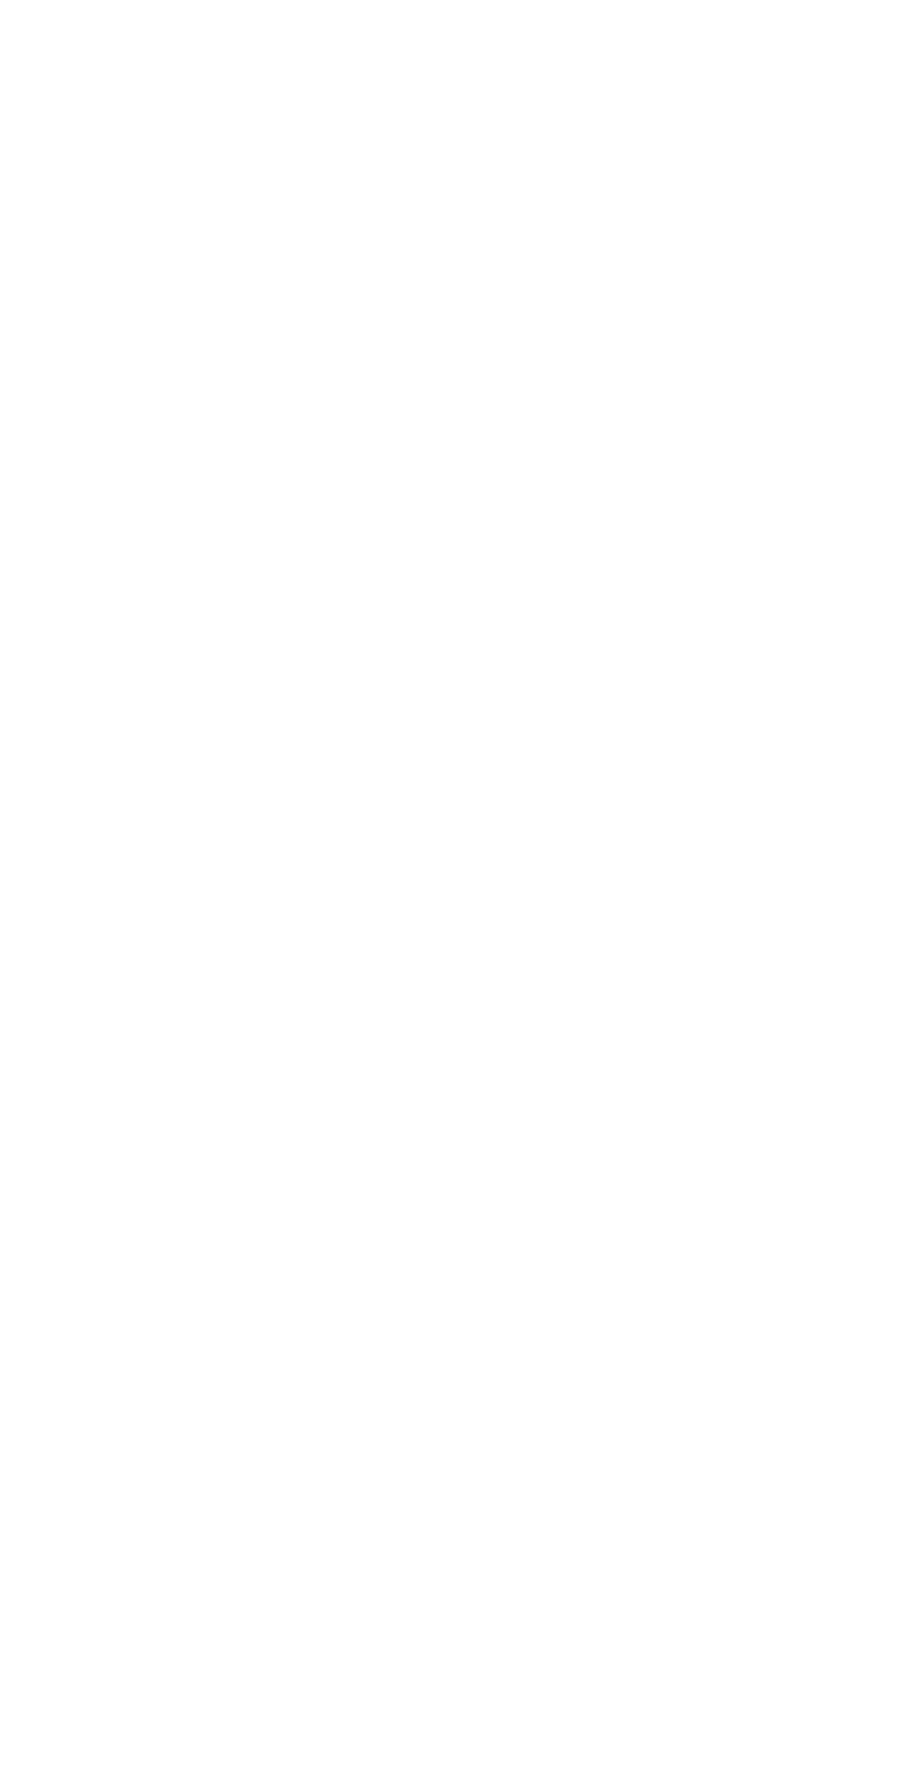 H2air - illustration